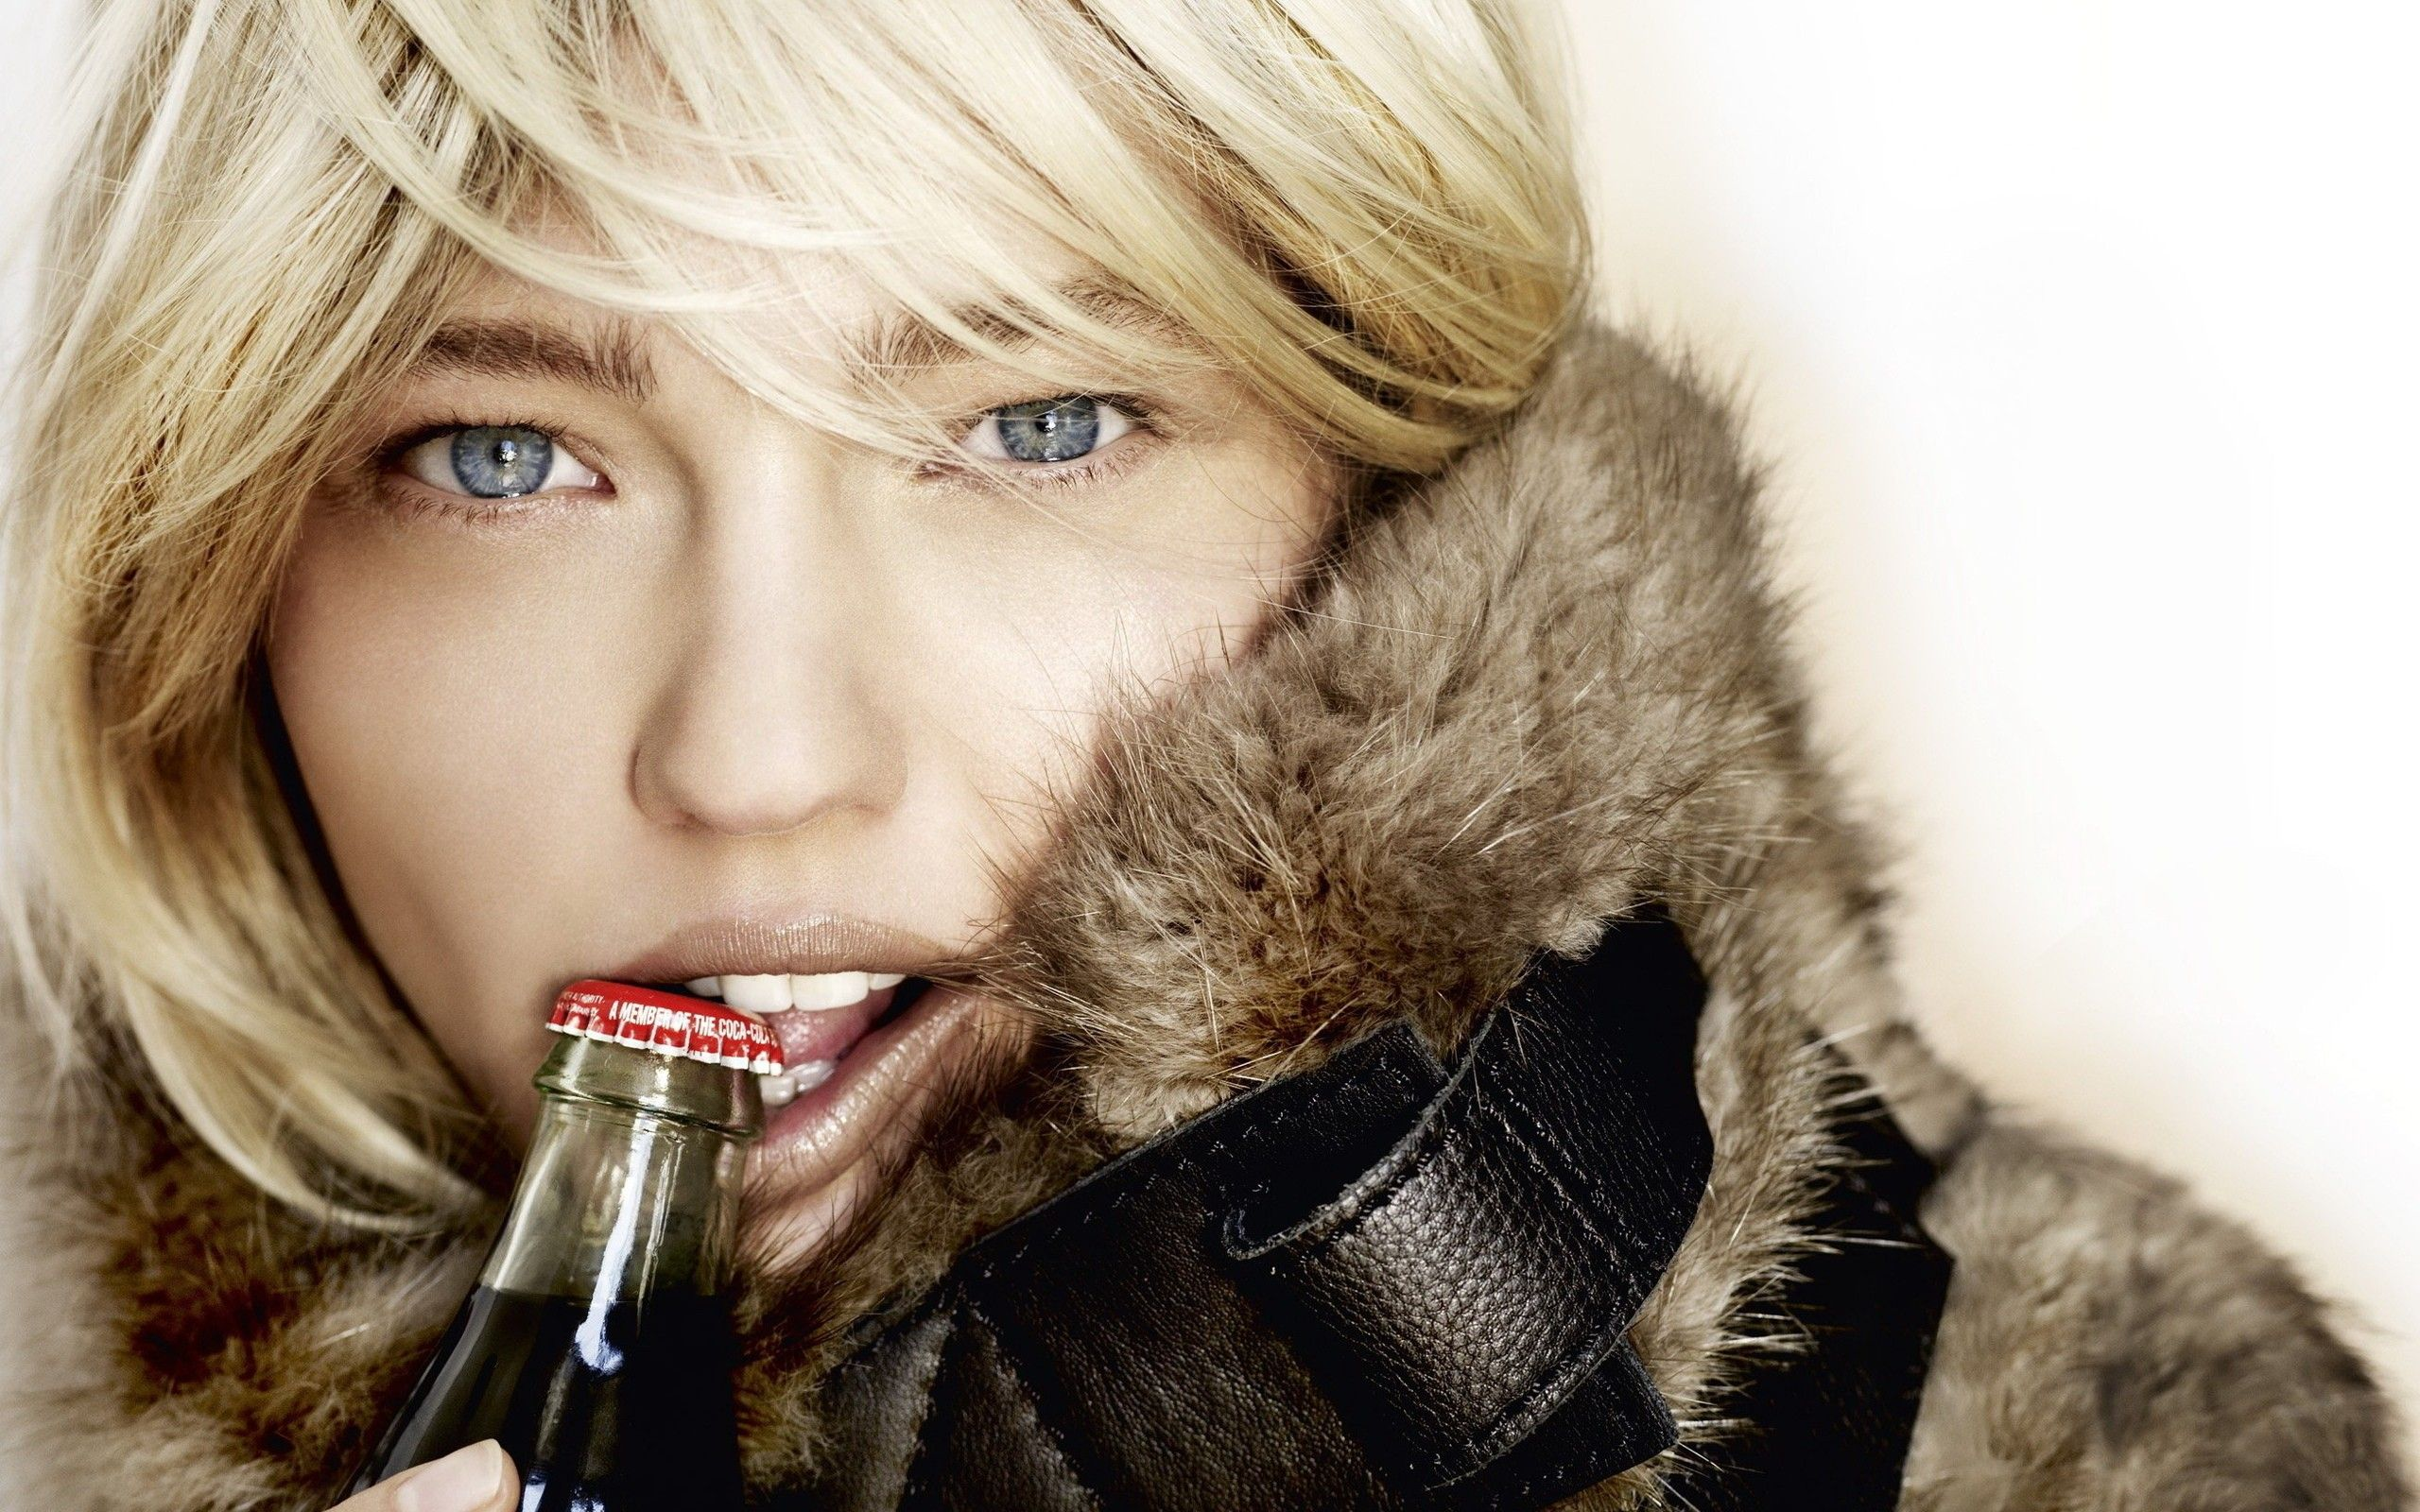 women-blonde-blue-eyes-coca-cola-fur-biting-face-sasha-pivovarova-2560x1600.jpg (2560×1600)